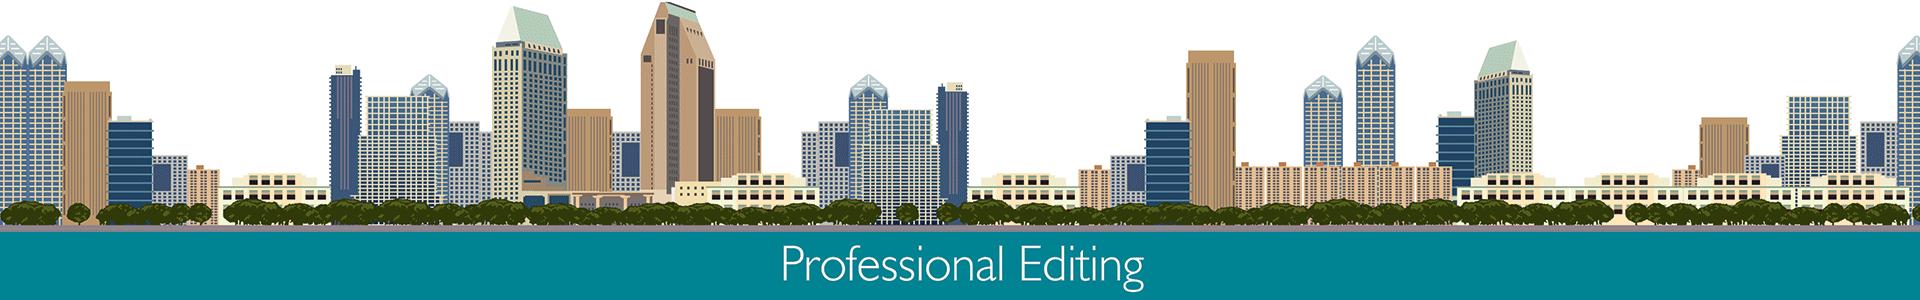 Professional Editing